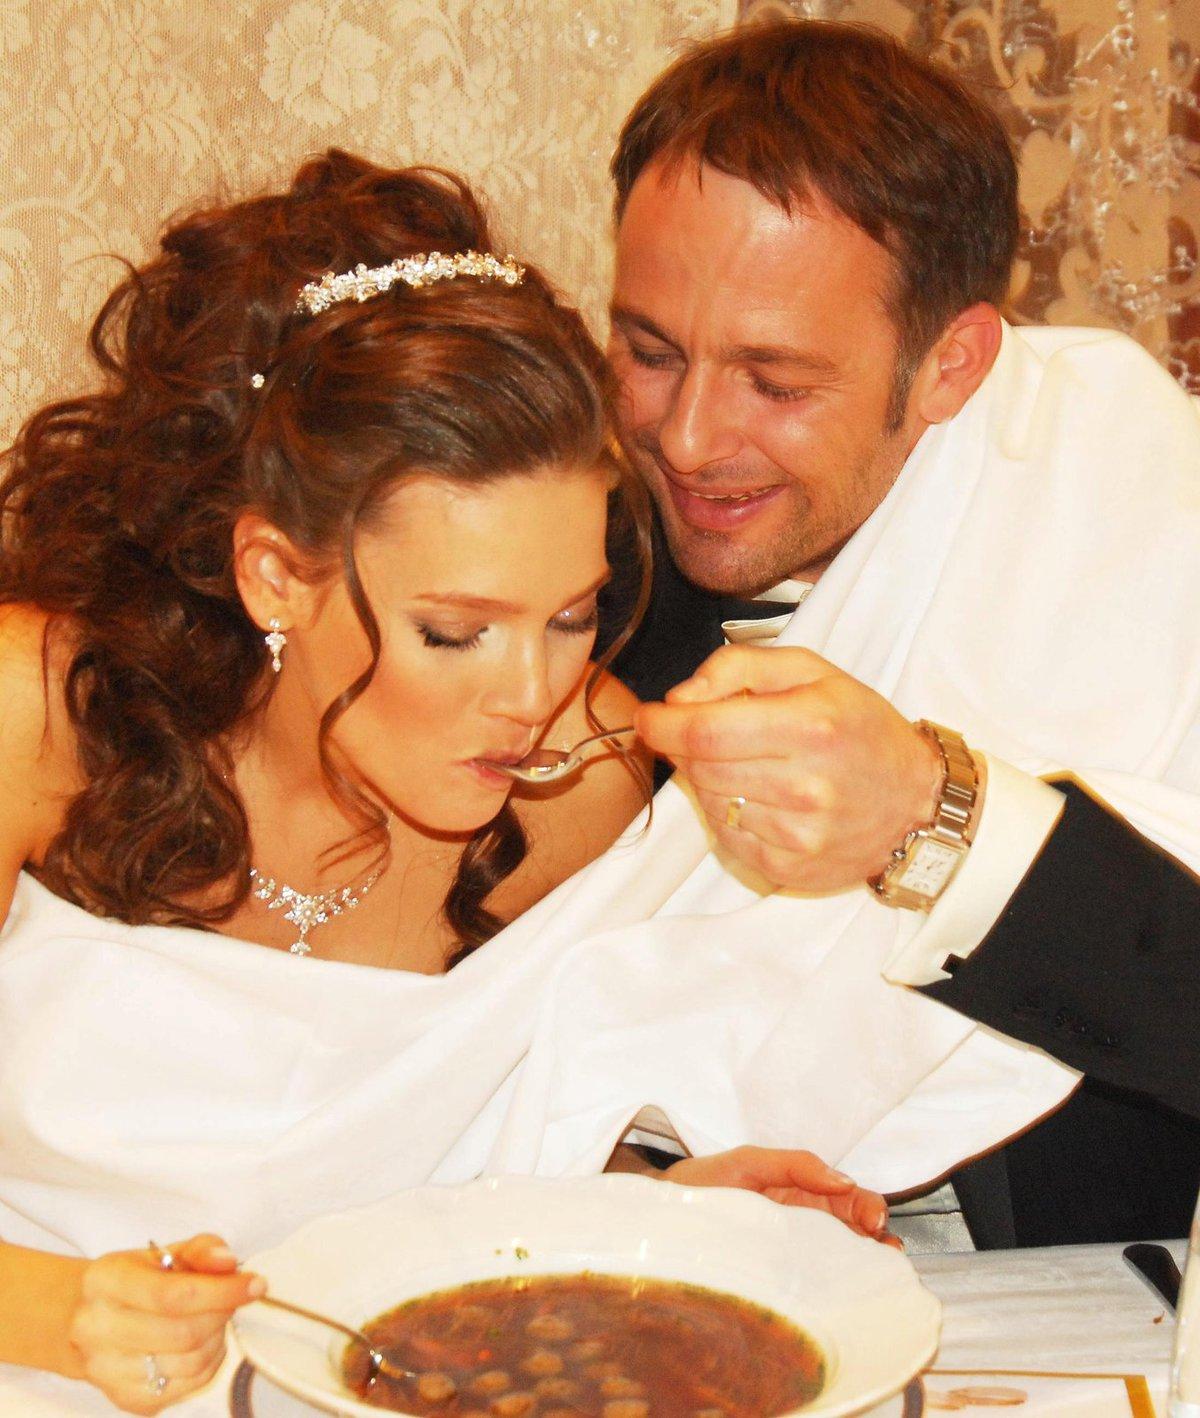 Svatba Andrey Verešové s Danielem Volopichem.